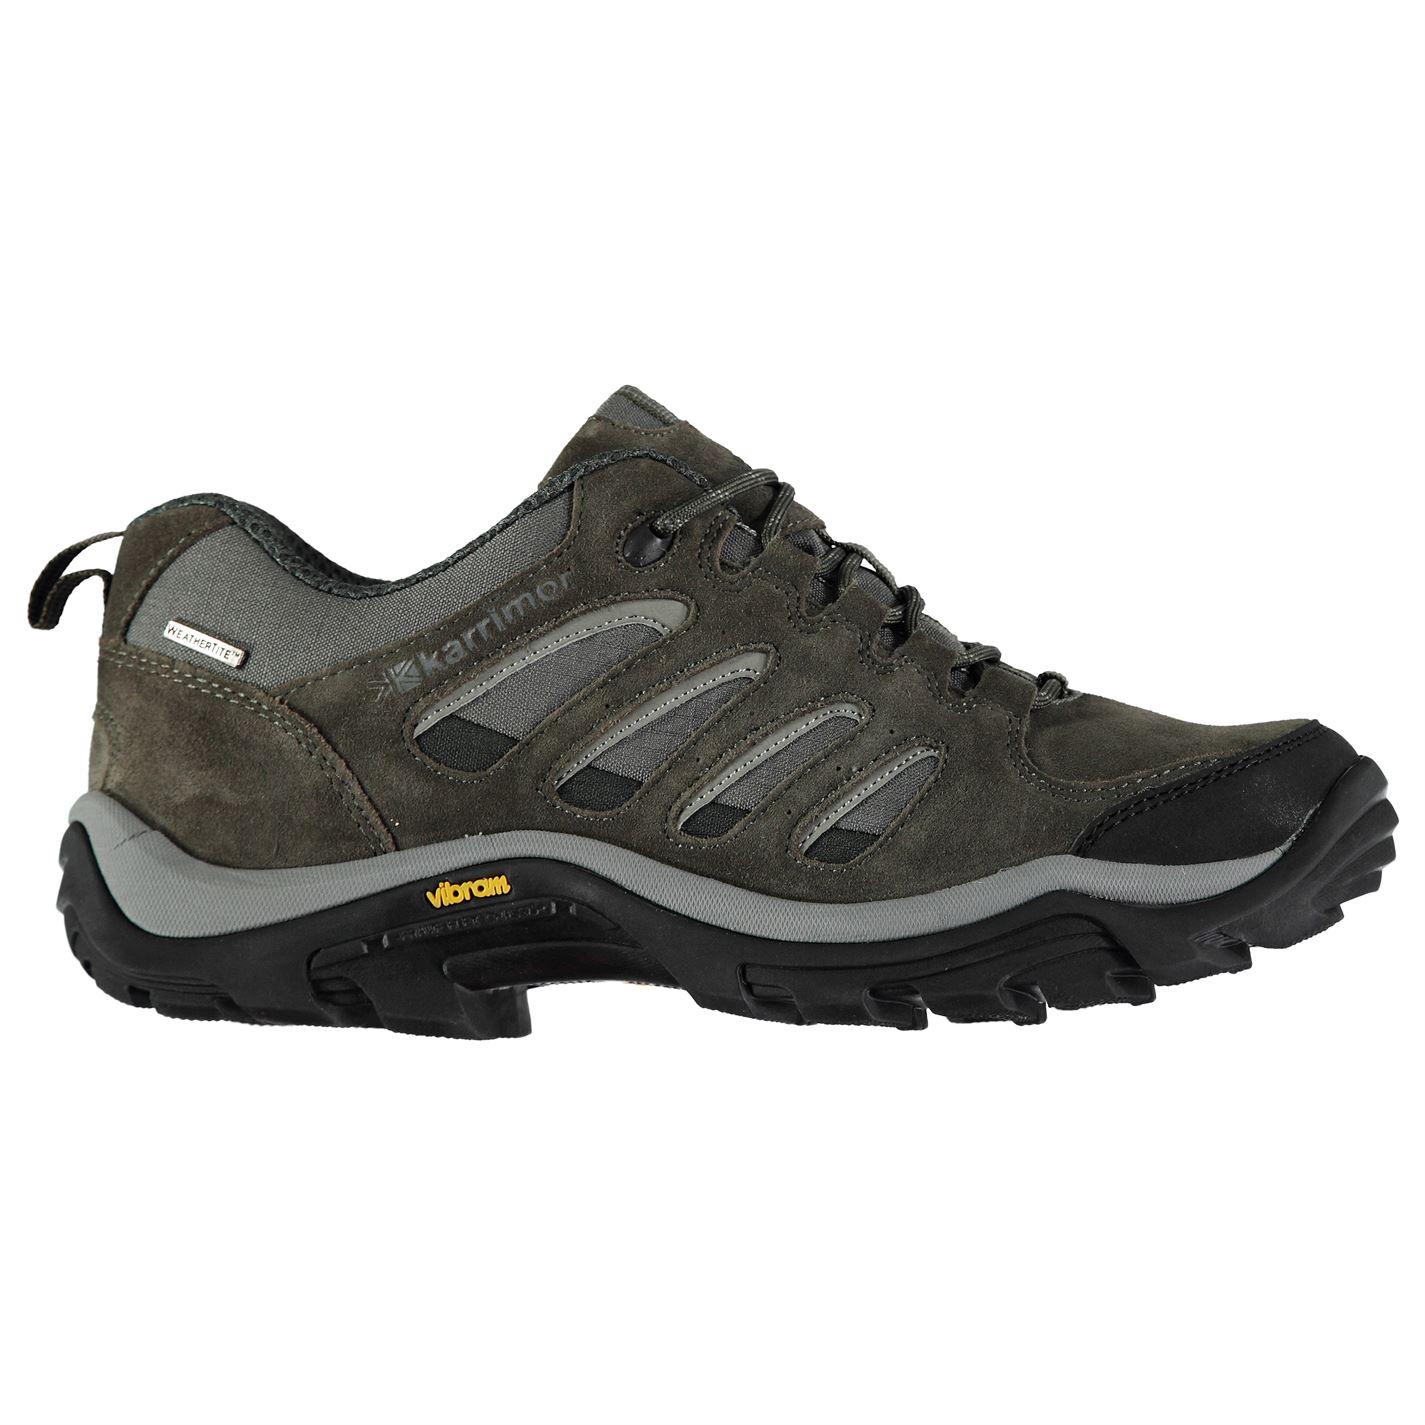 Karrimor Aspen Low Mens Walking Shoes